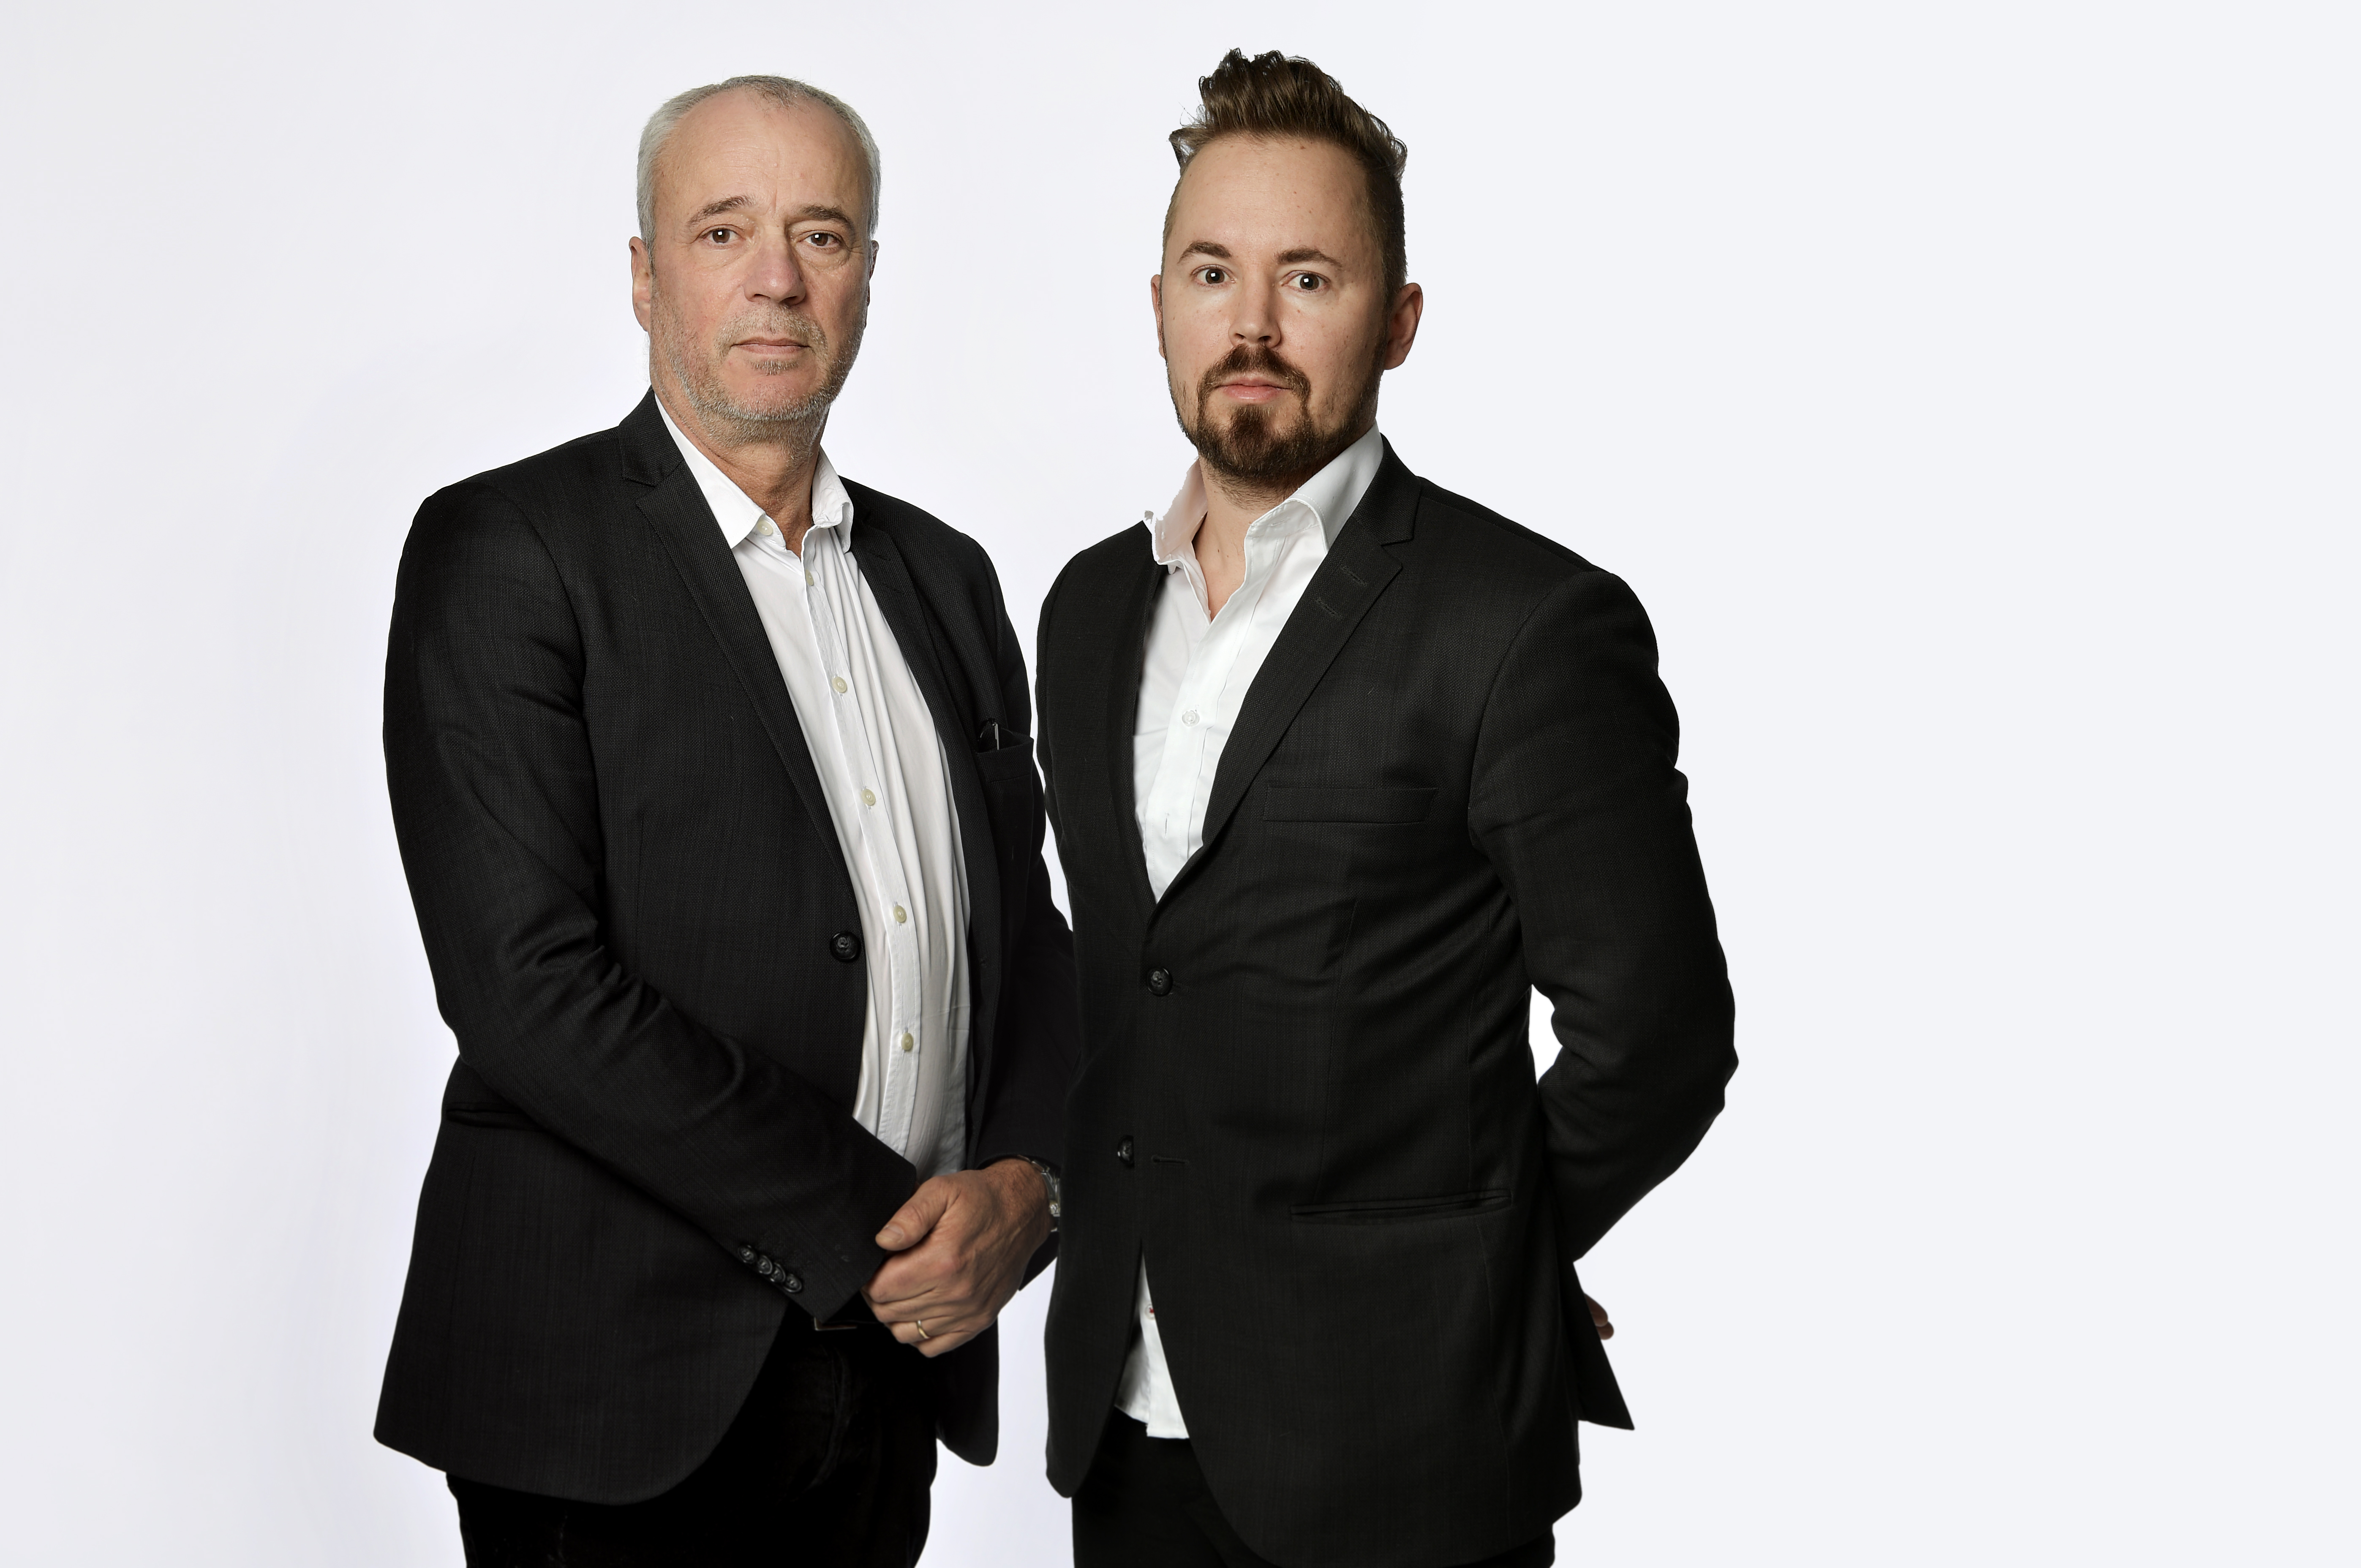 foto : stemat : richard aschberg och mattias sandberg, aftonbladet